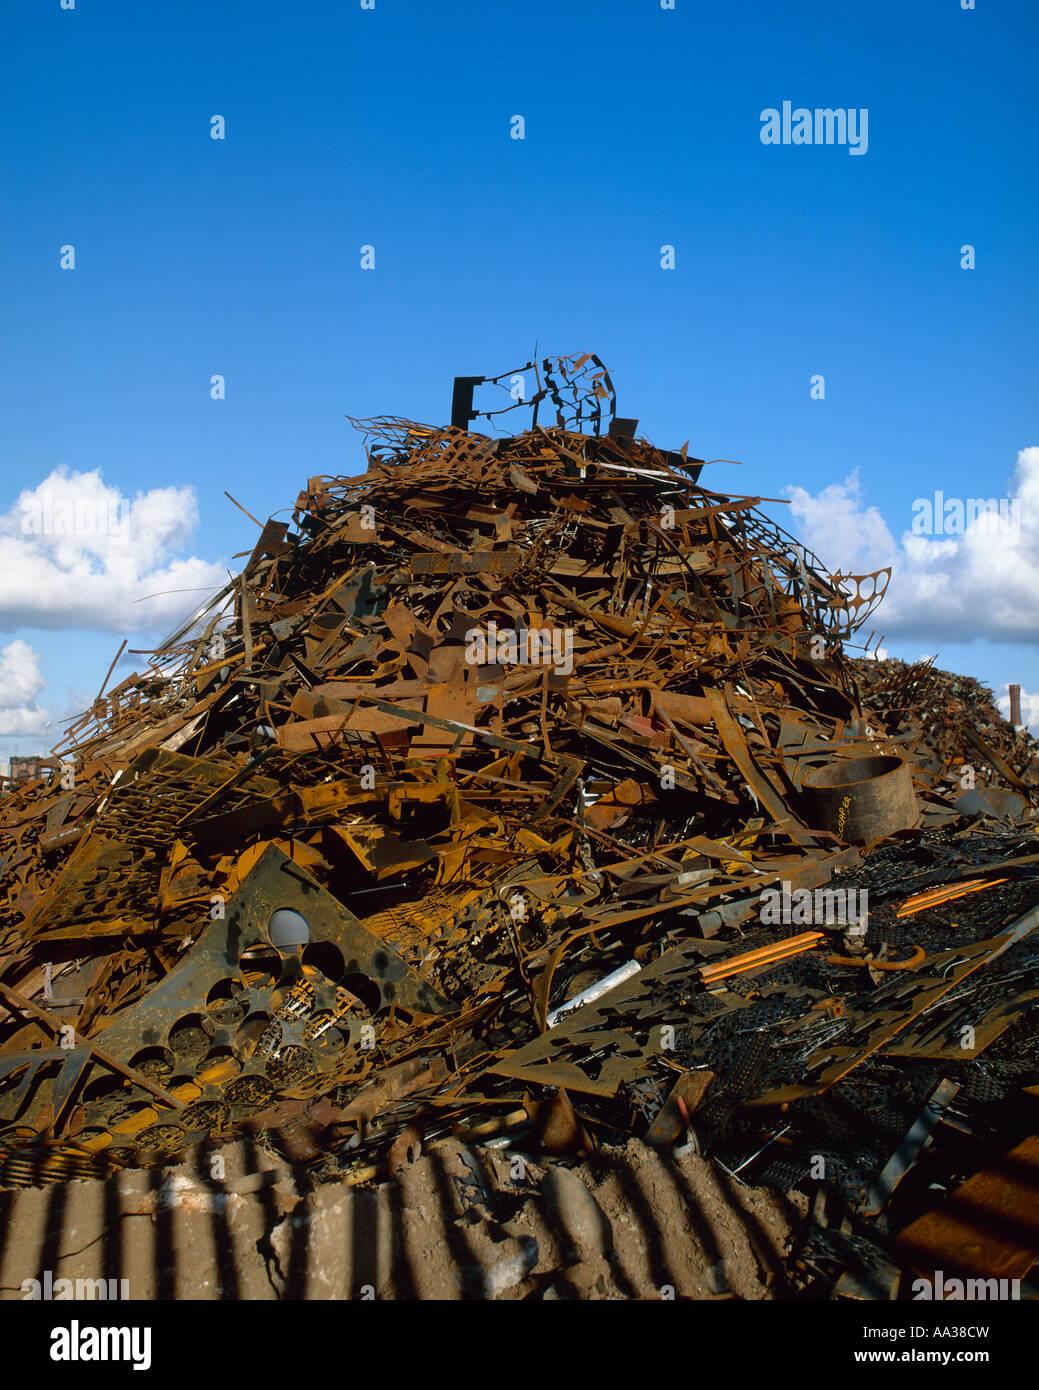 Scrap Metal England - Stock Image